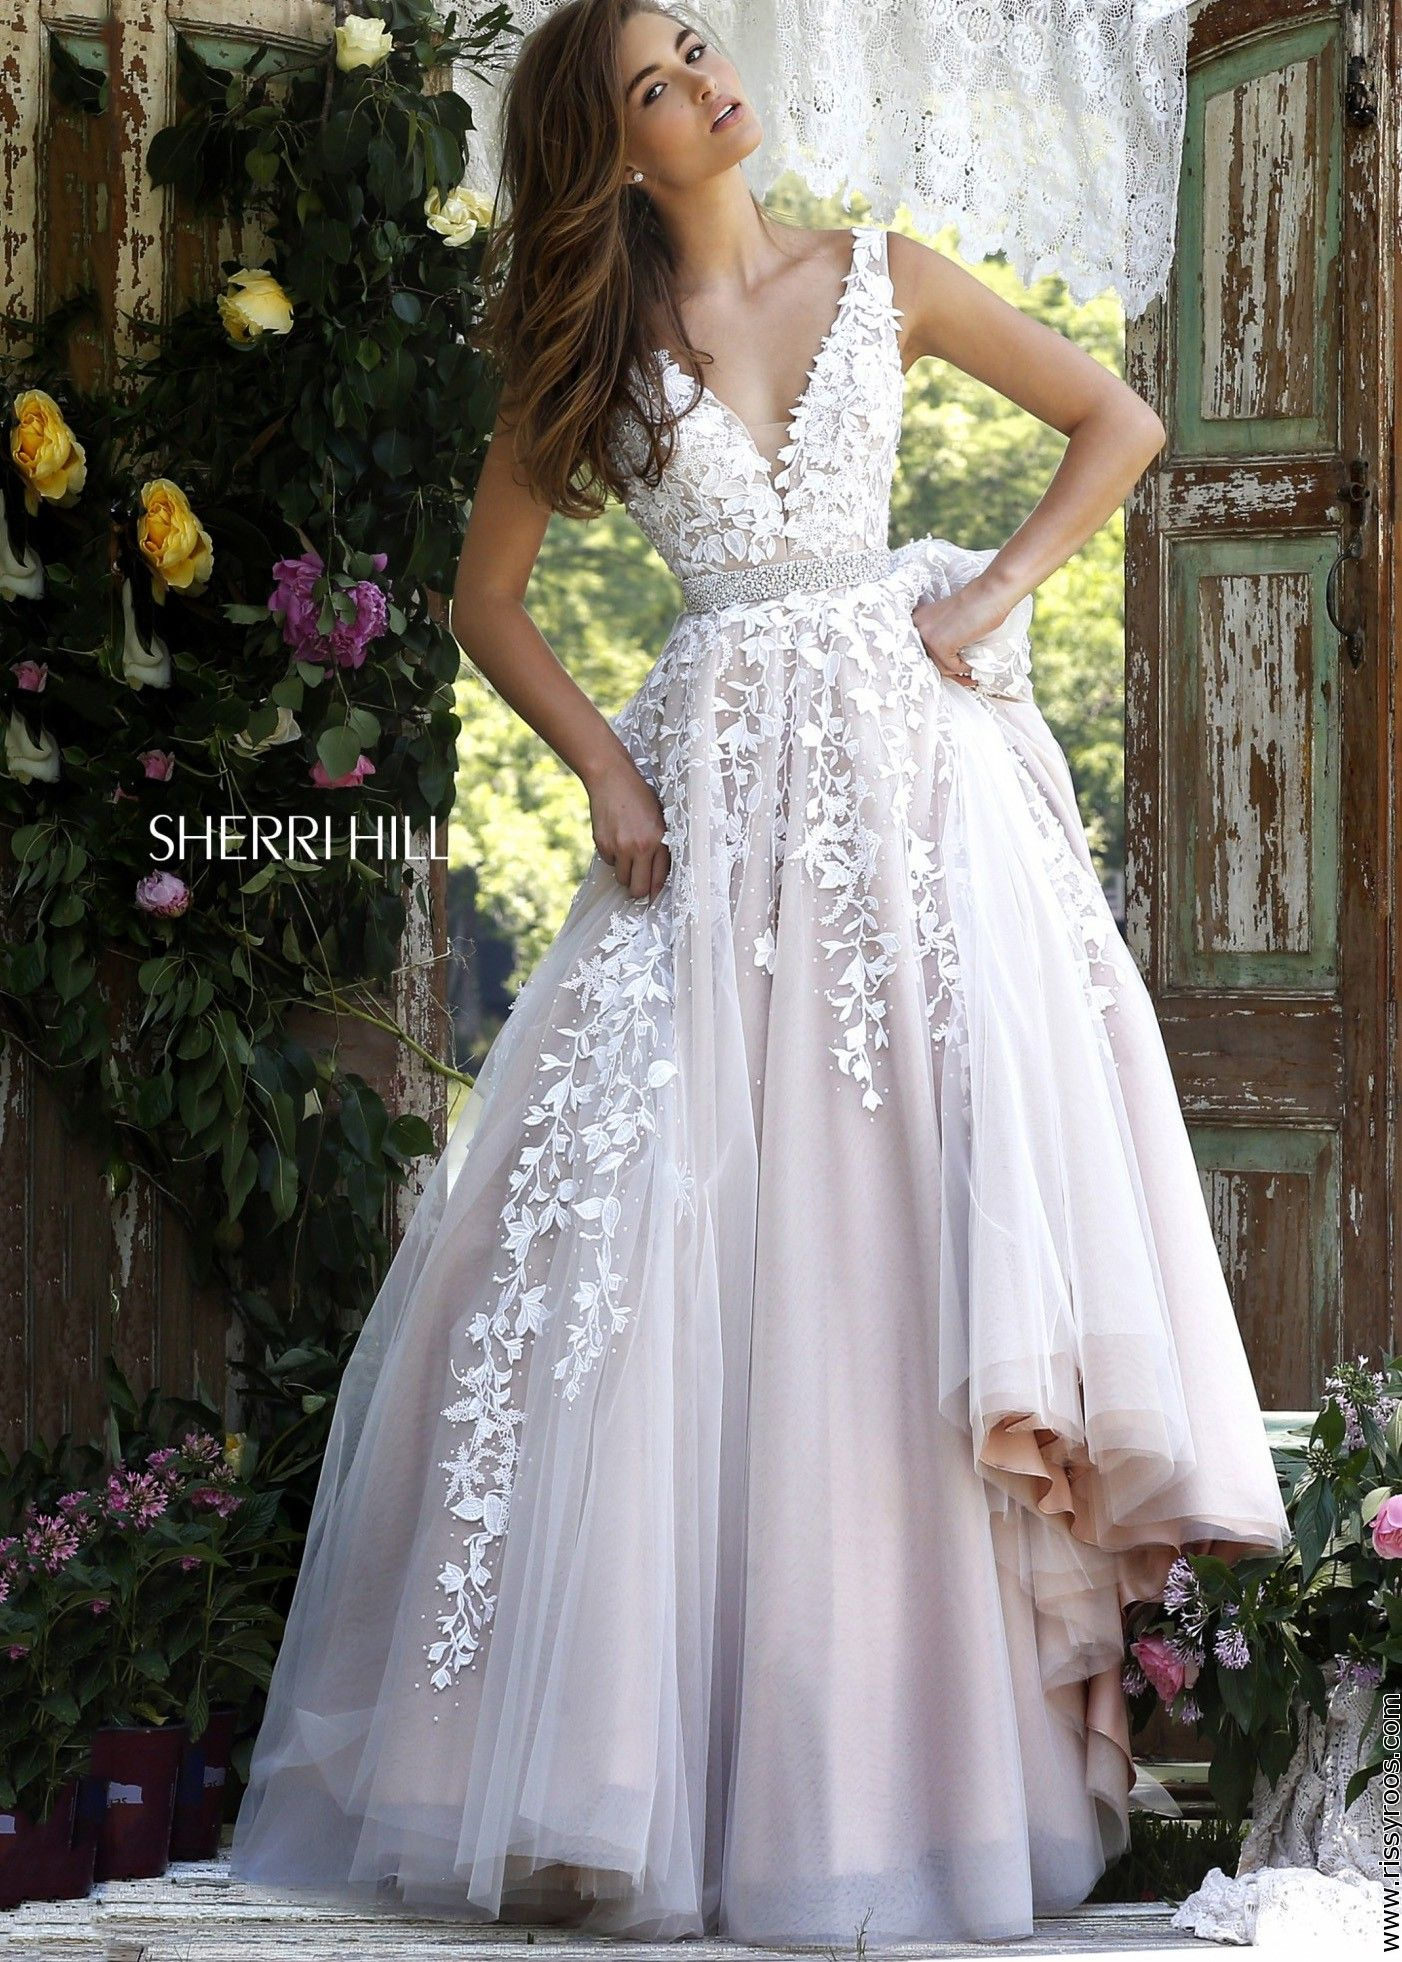 Sherri hill fancy lace embroidered ball gown fancy shmancy